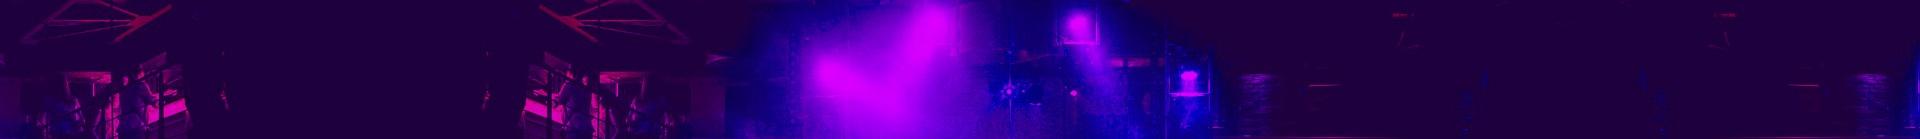 Purple Black Page Divider